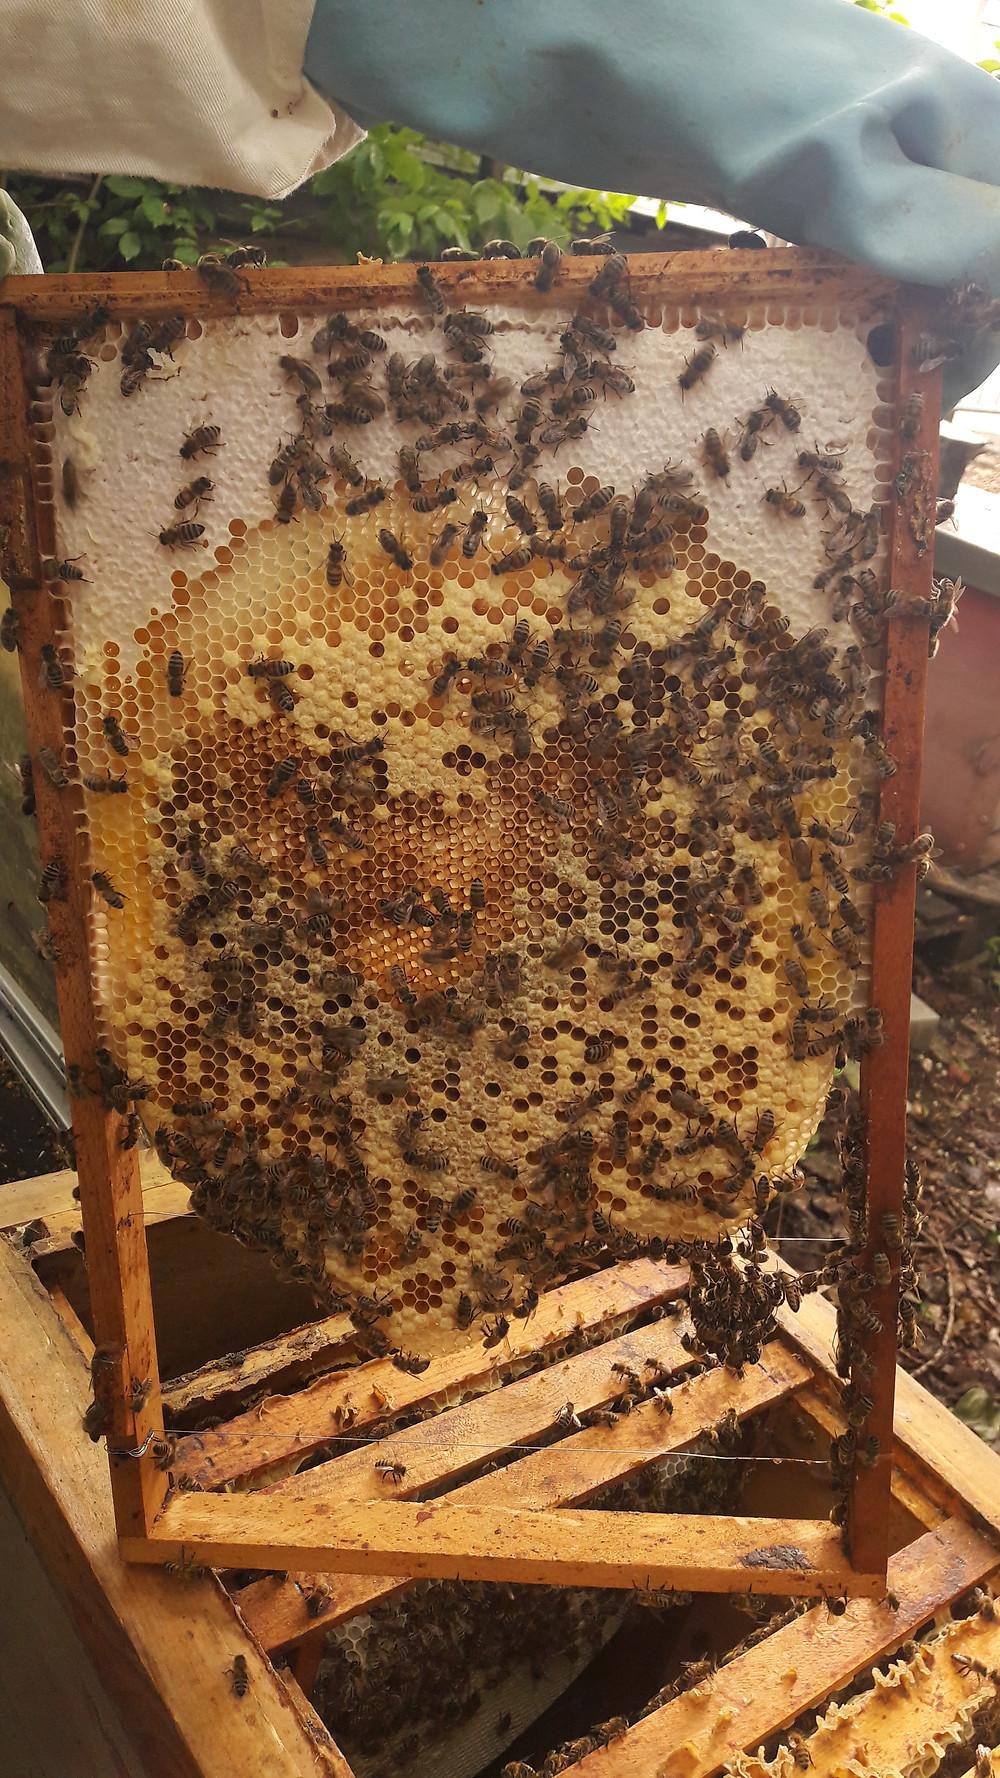 Religion Spiritualität Bienenvolk Bienen Imkerei Bien Superorganismus Natur morphisches Feld Intuition Gott